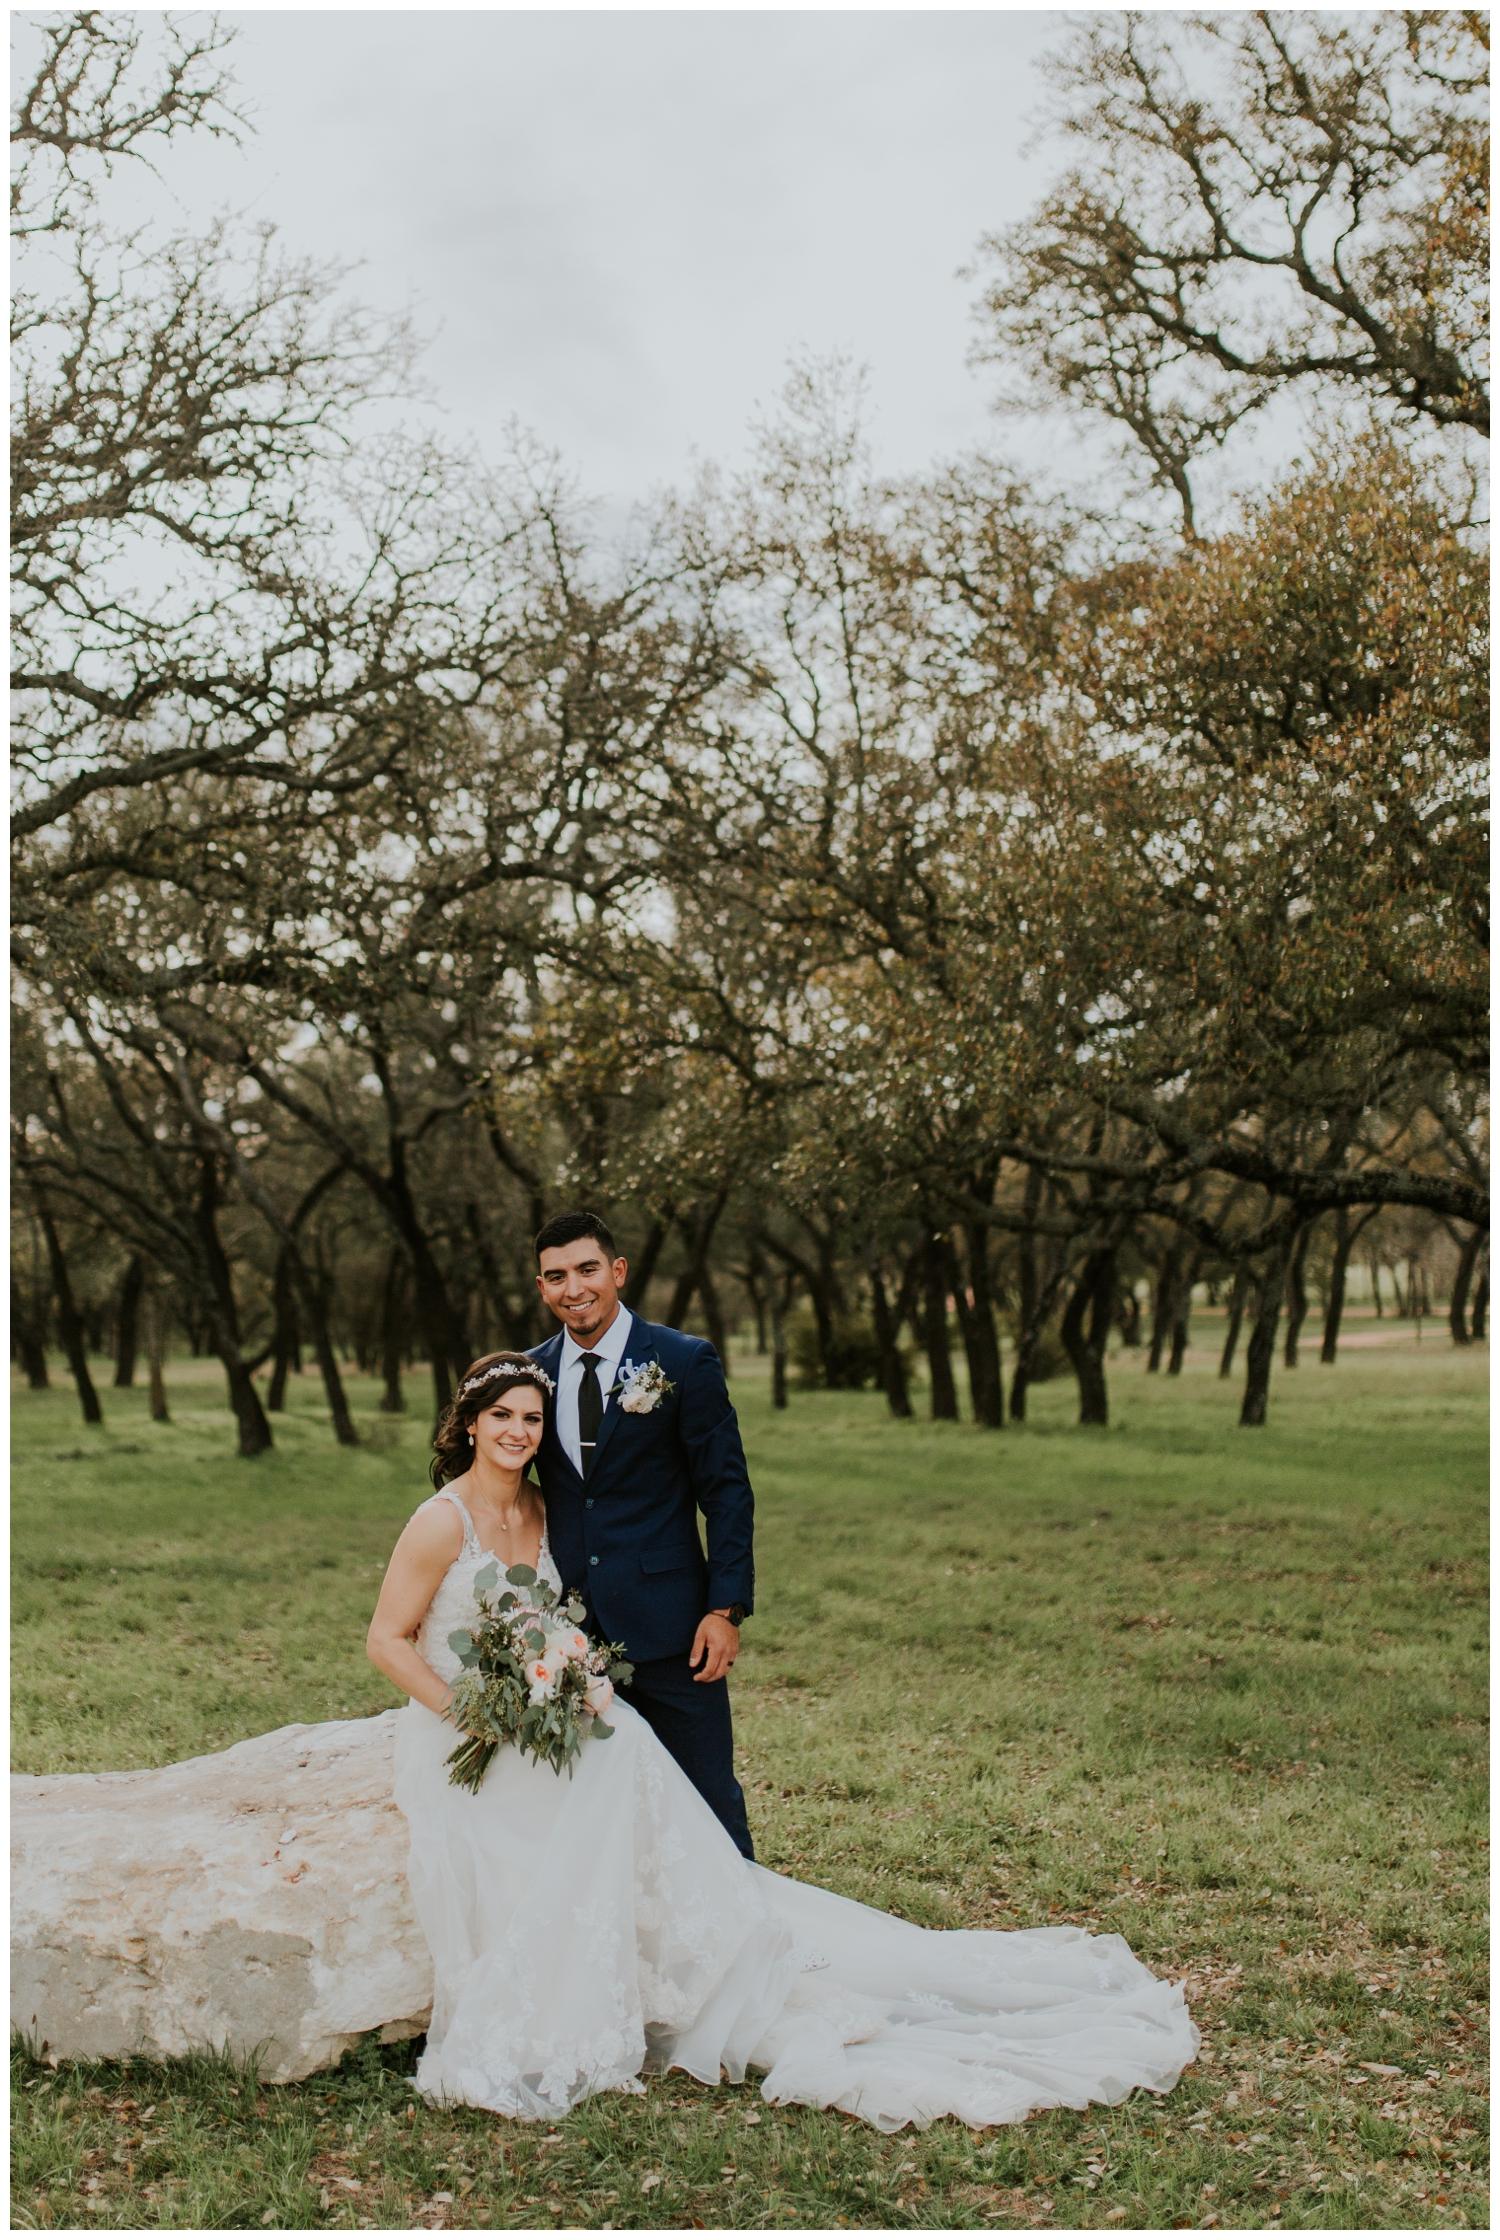 Ashlee+Mike, Featherstone Ranch Spring Wedding, San Antonio, Contista Productions Wedding Photography_0014.jpg